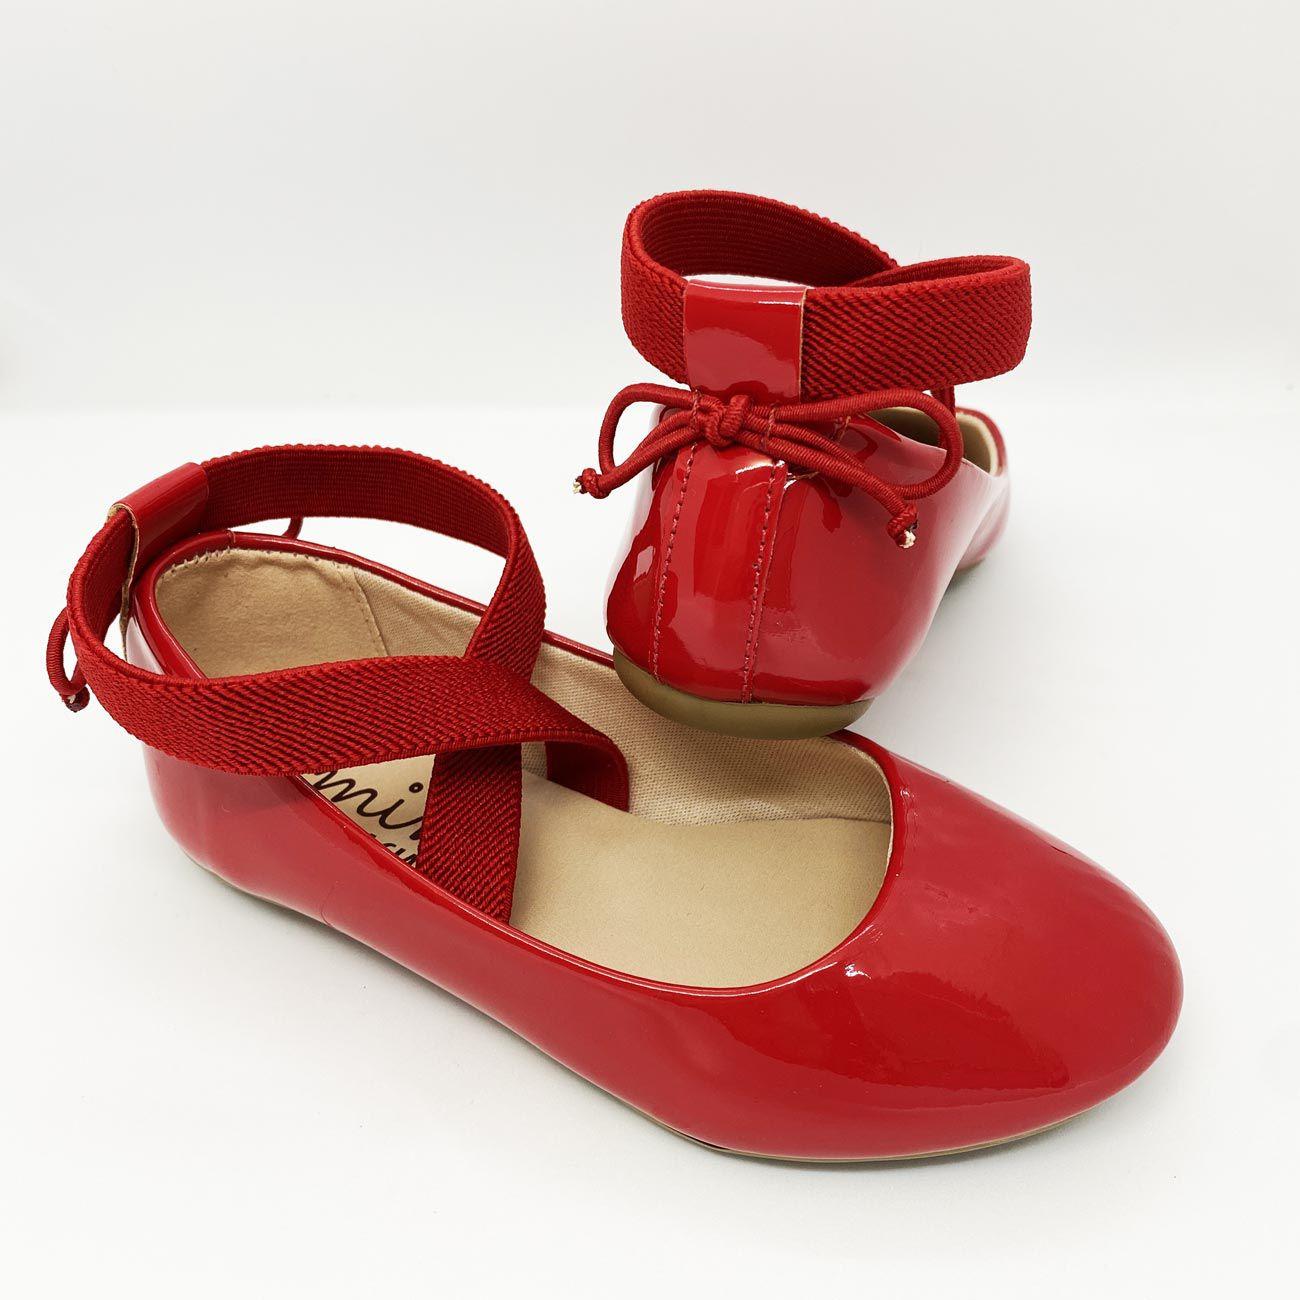 Sapatilha Infantil Feminina Vermelha Sua Cia Mini